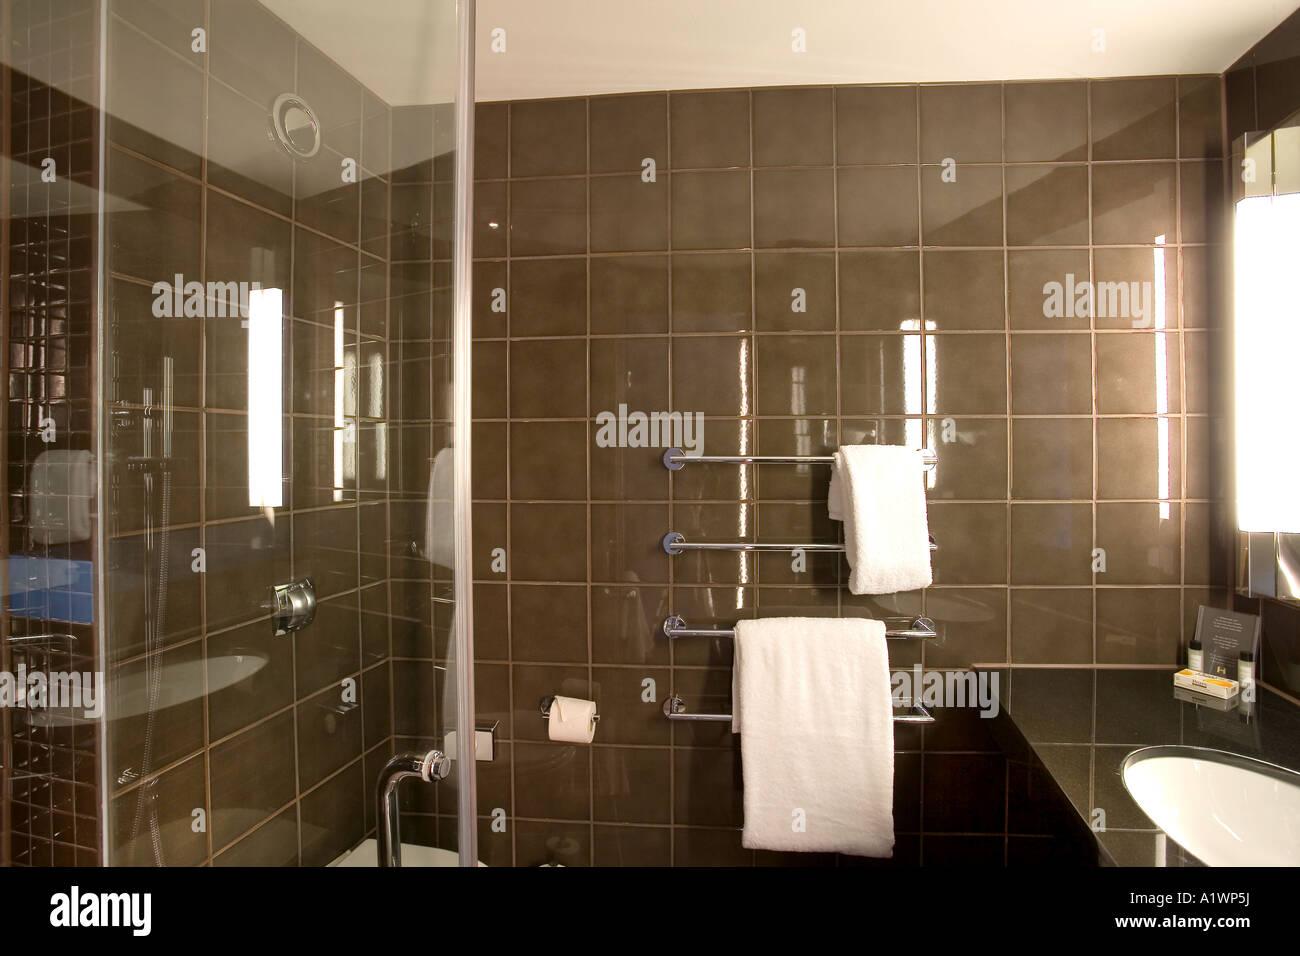 the hoxton hotel urban lodge london 2006 bathroom